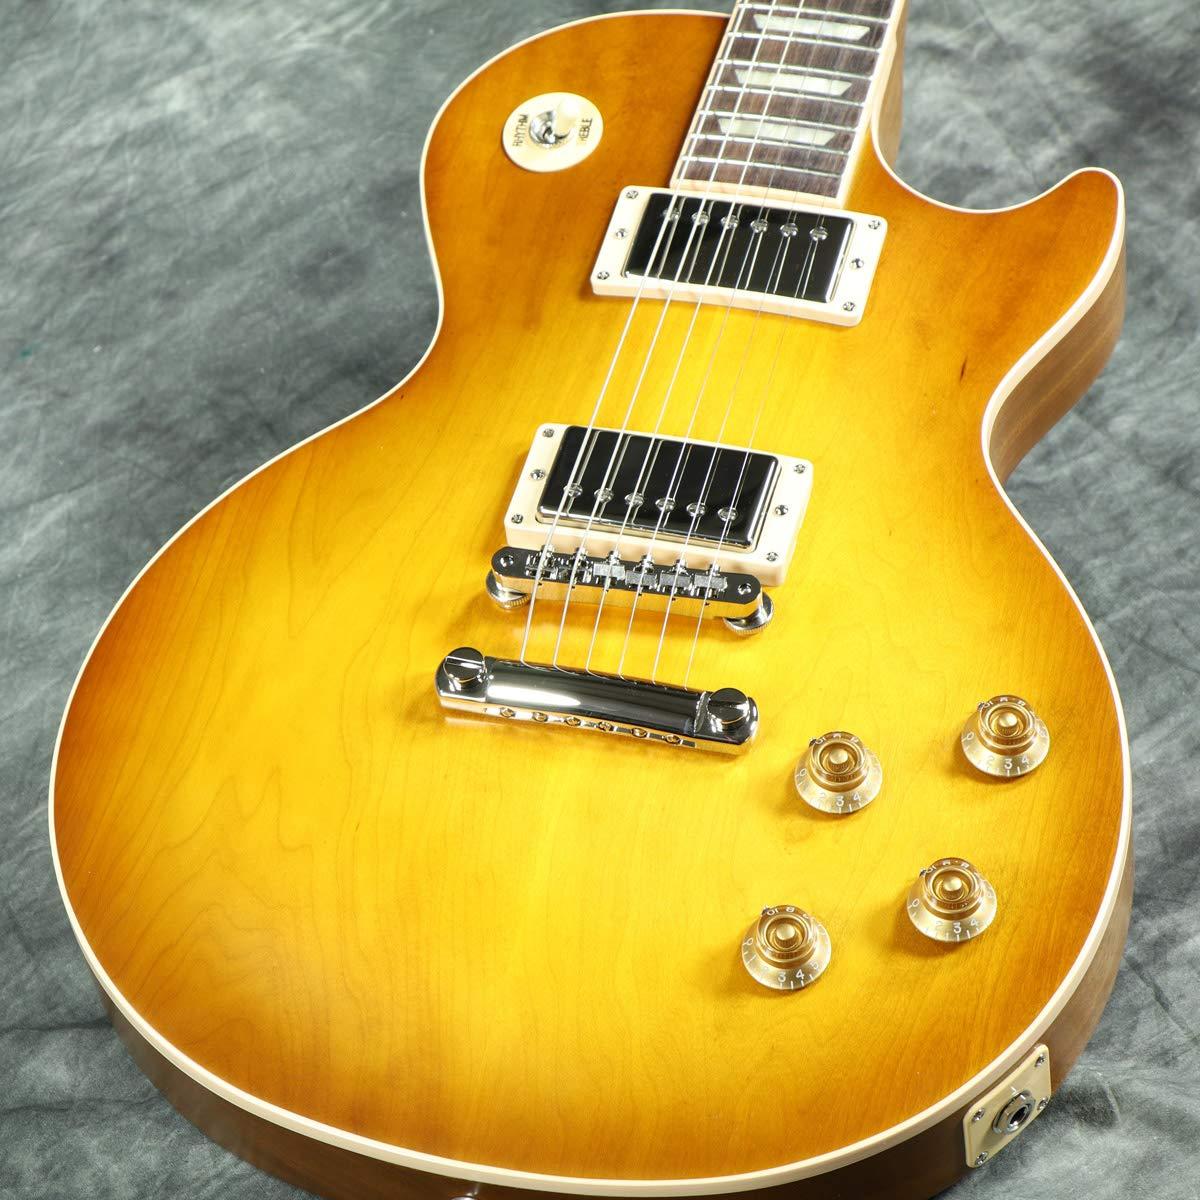 Gibson USA/Les Paul Standard 2019 Faded -Satin Honeyburst 60s Plain Top ギブソン   B07PMH7RCF